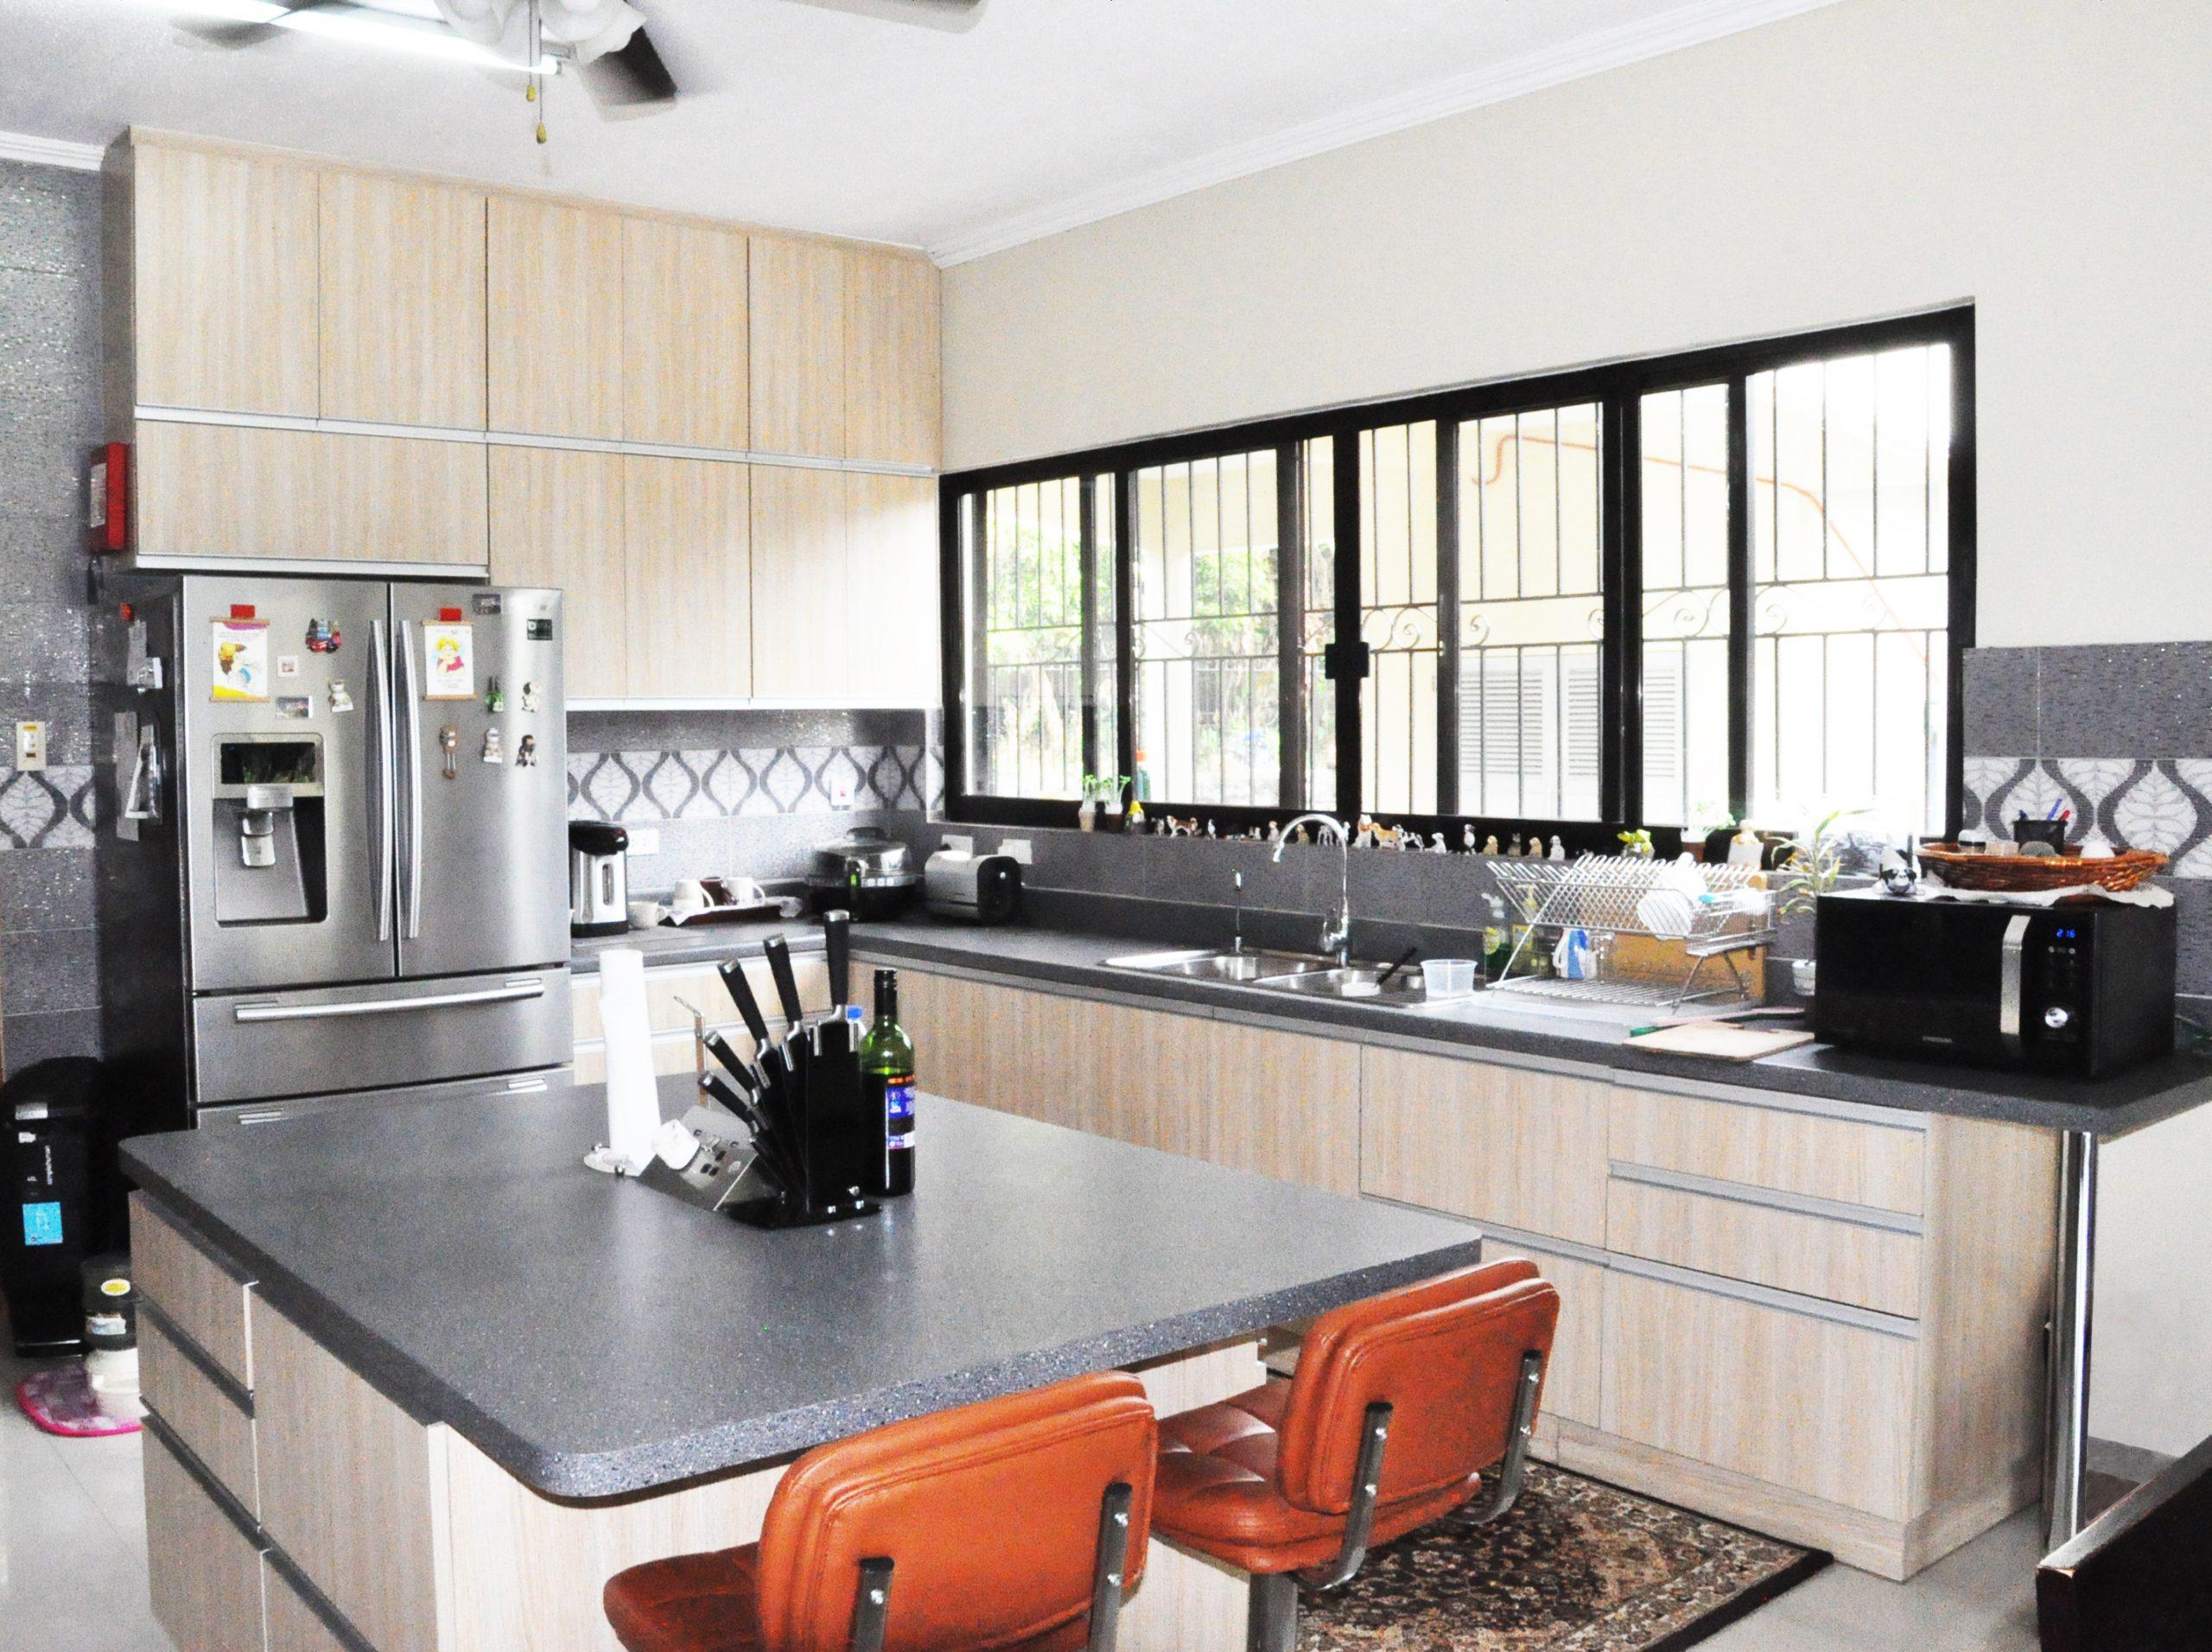 Kitchen Cabinet 95131 • Patio Ideas